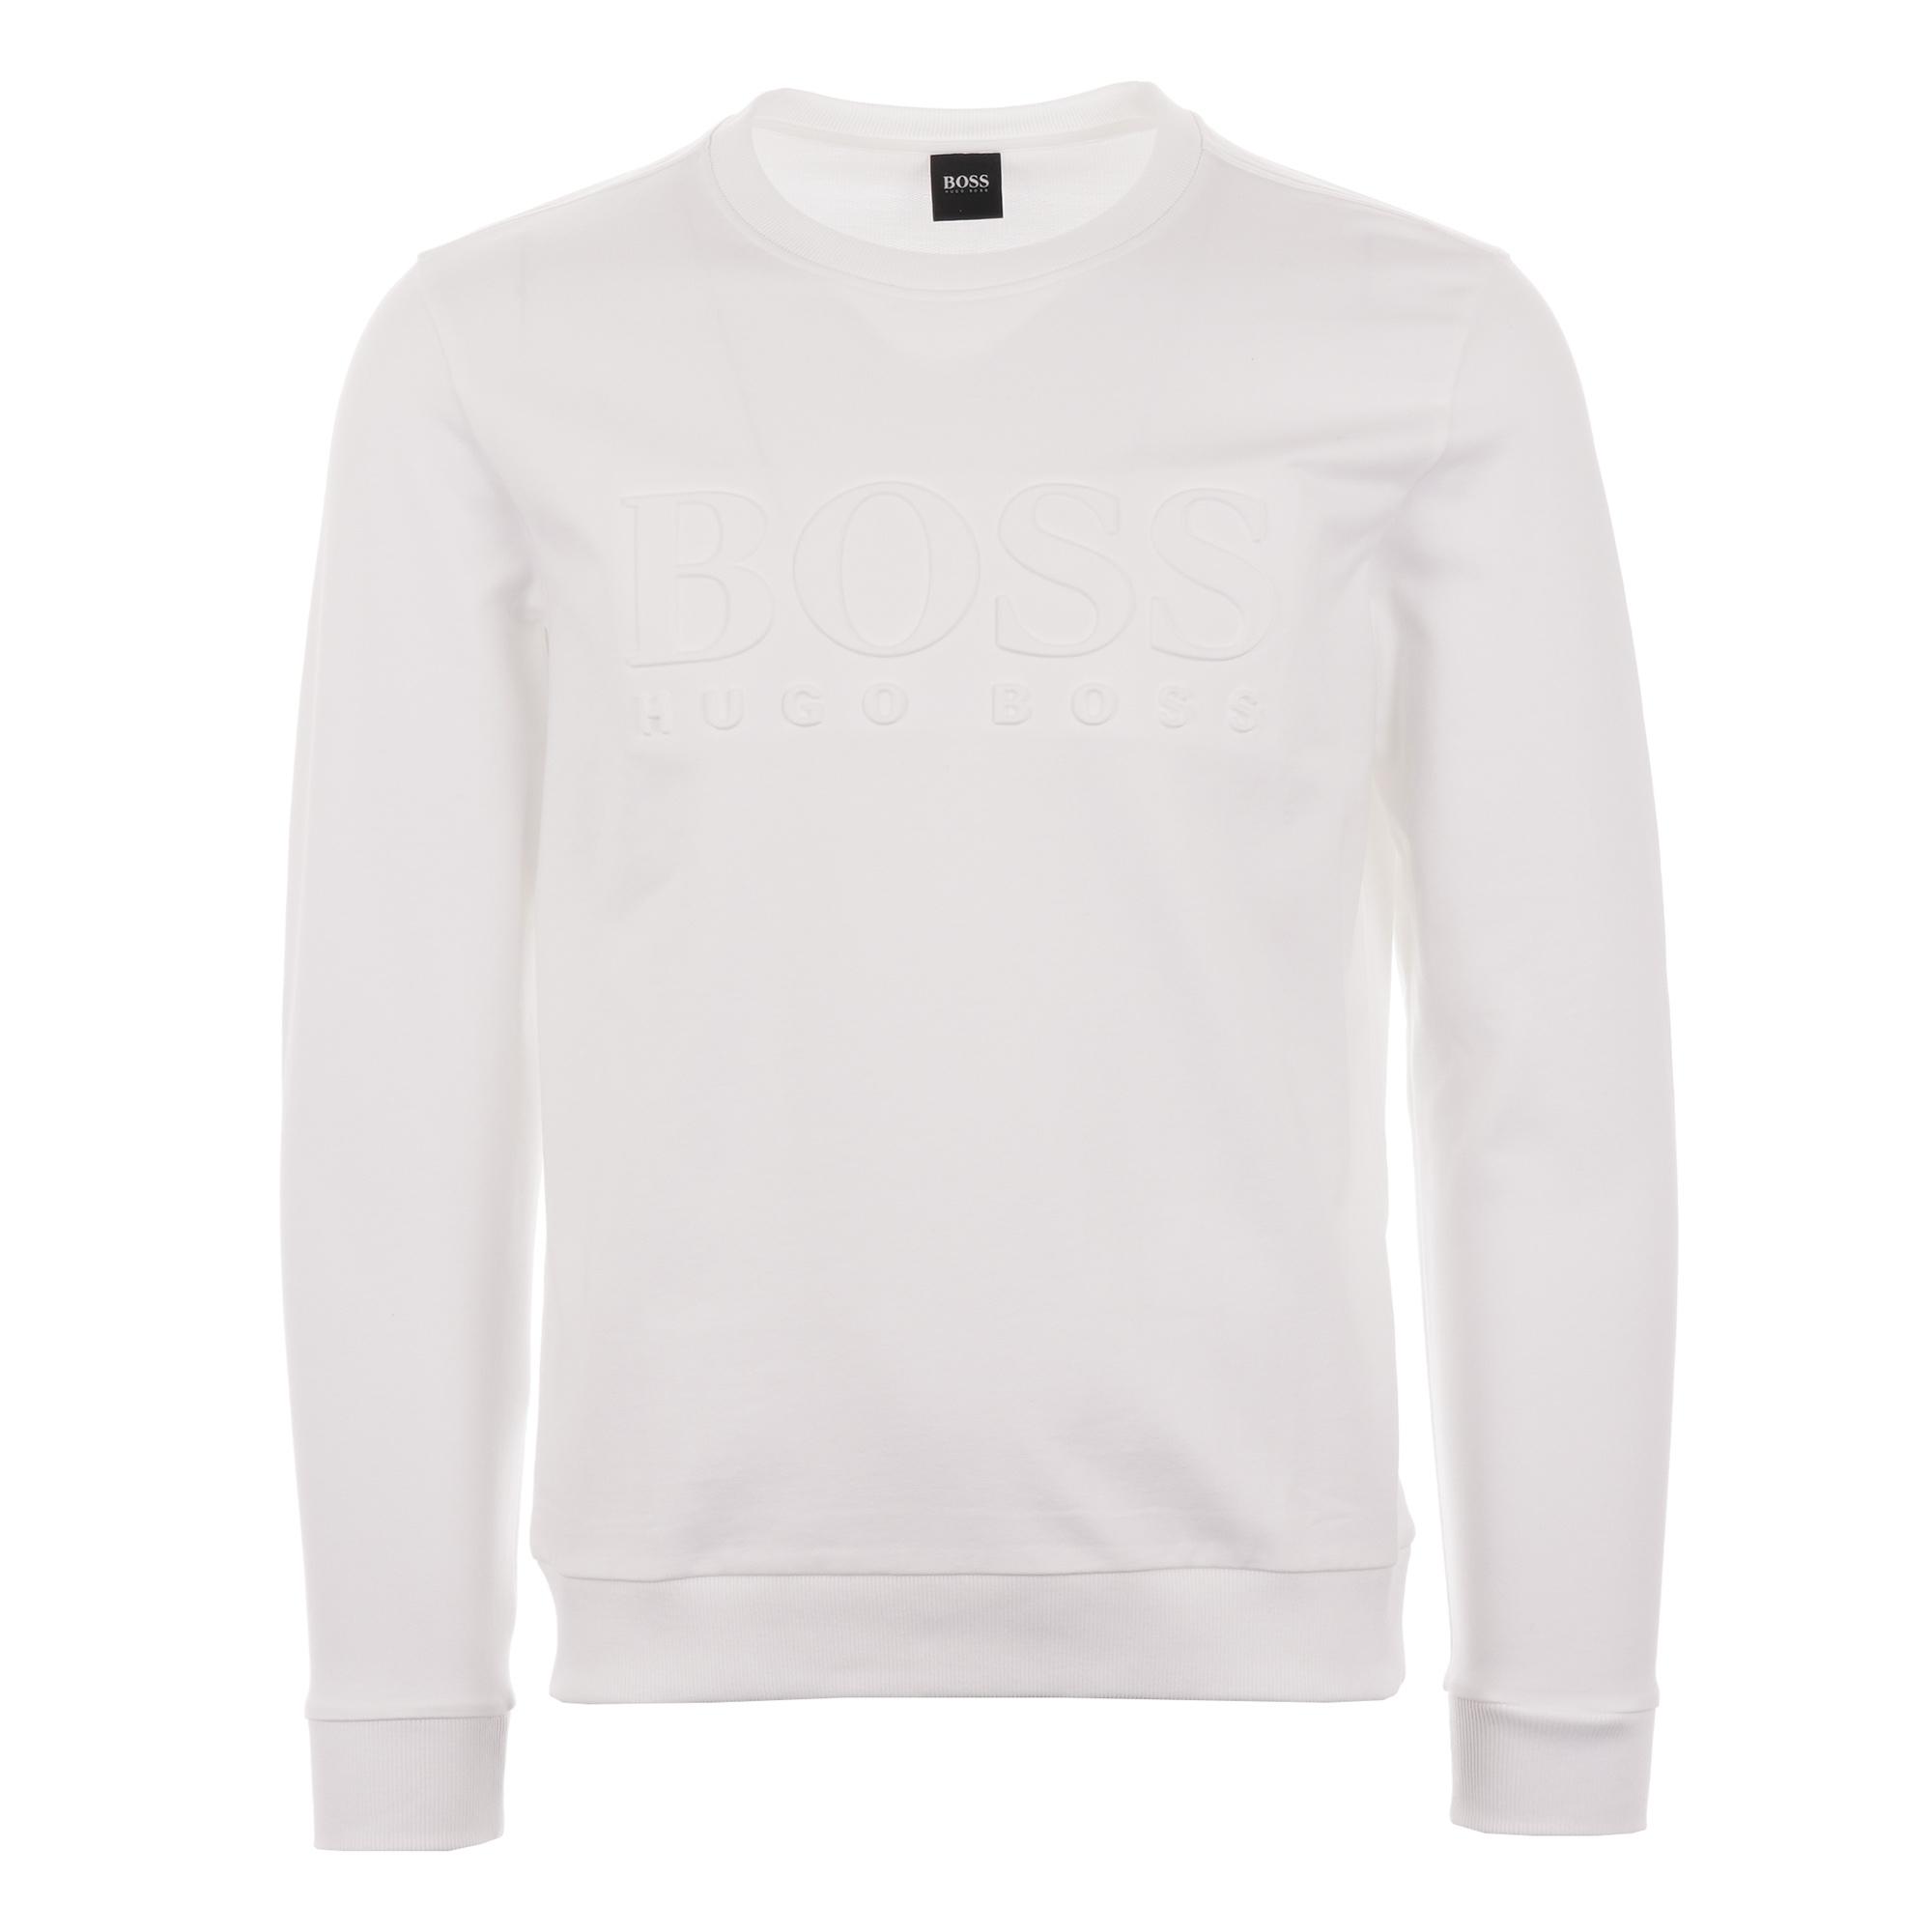 Ellesse 90/'s Outline Sweat in White embroidered crew sweatshirt jumper SALE